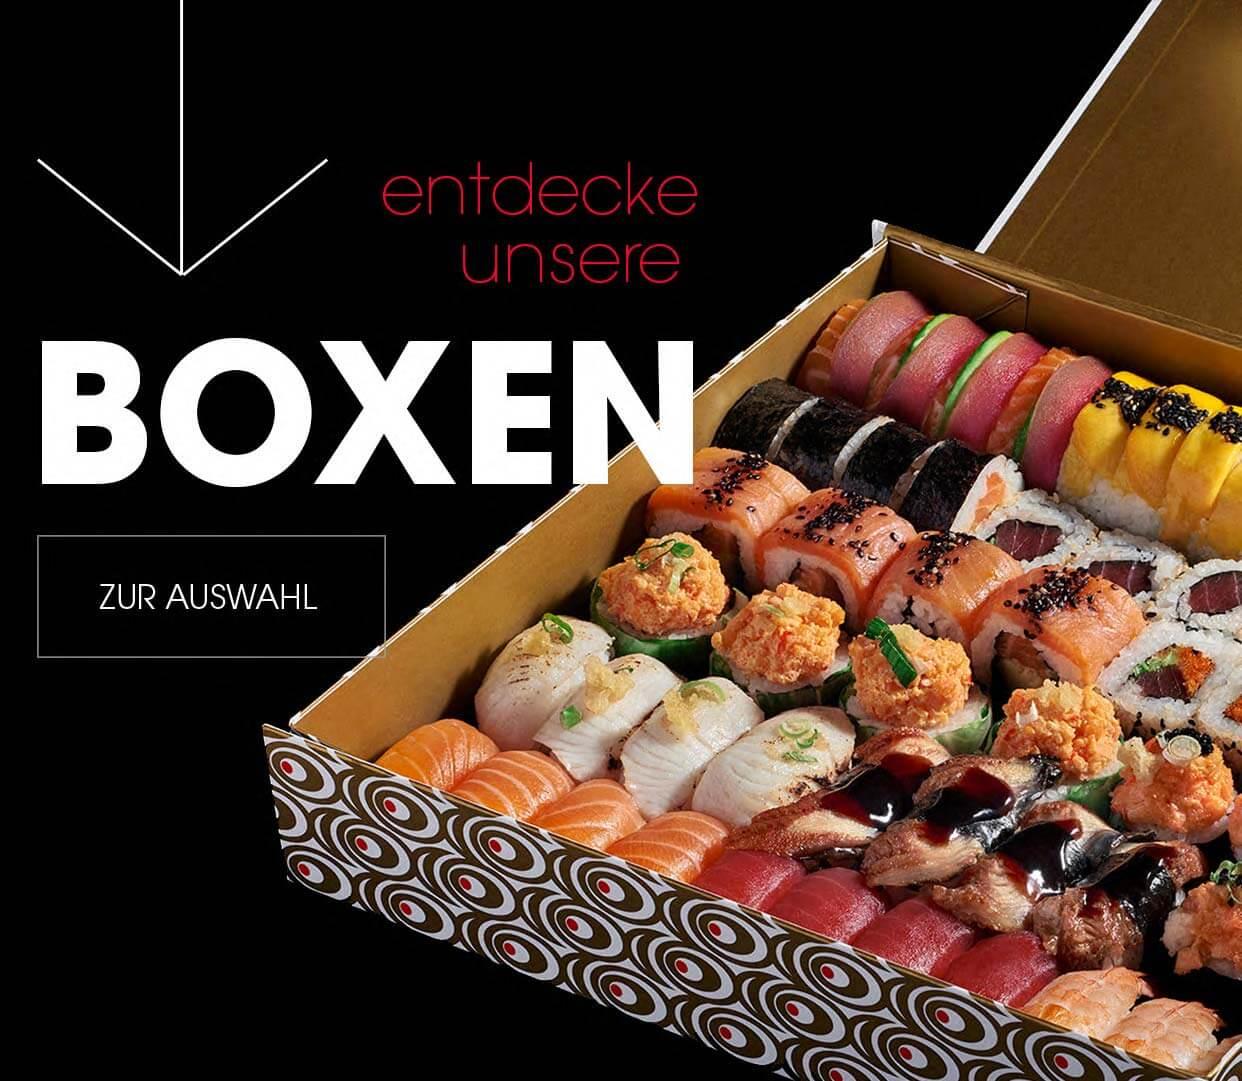 shizoo. Sushi Lieferservice München Sushi Boxen